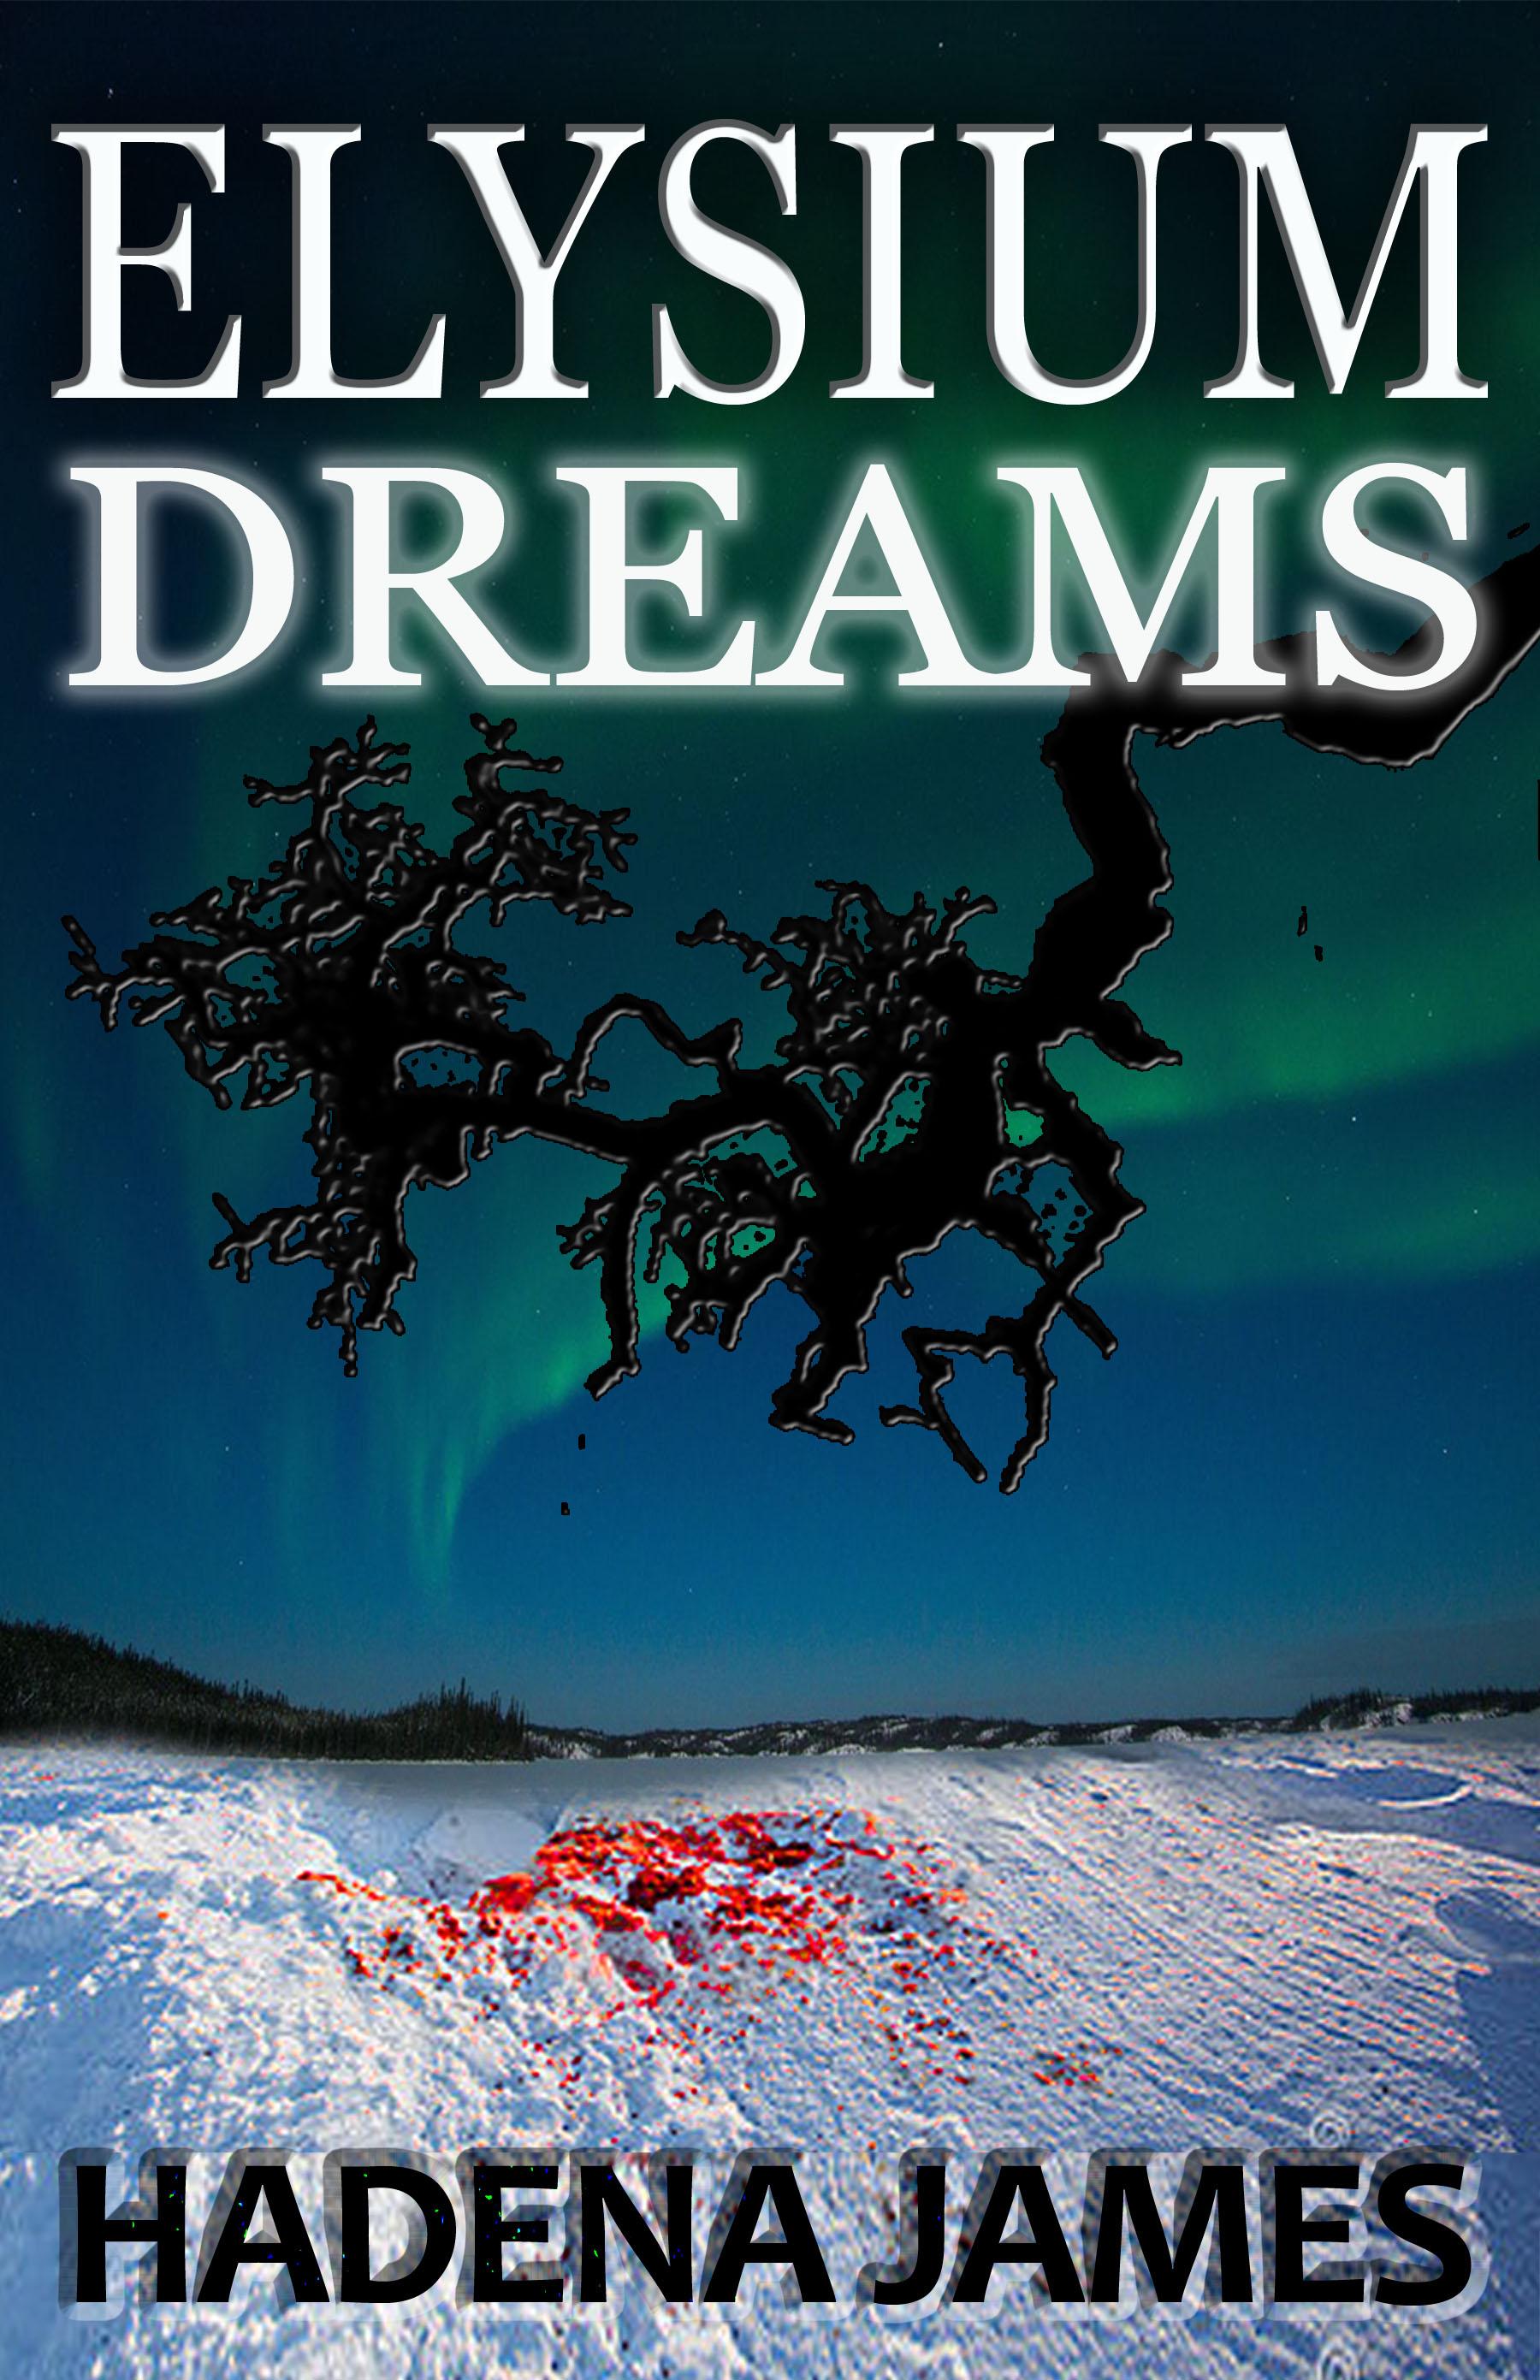 ELYSIUM_DREAMS_oversized